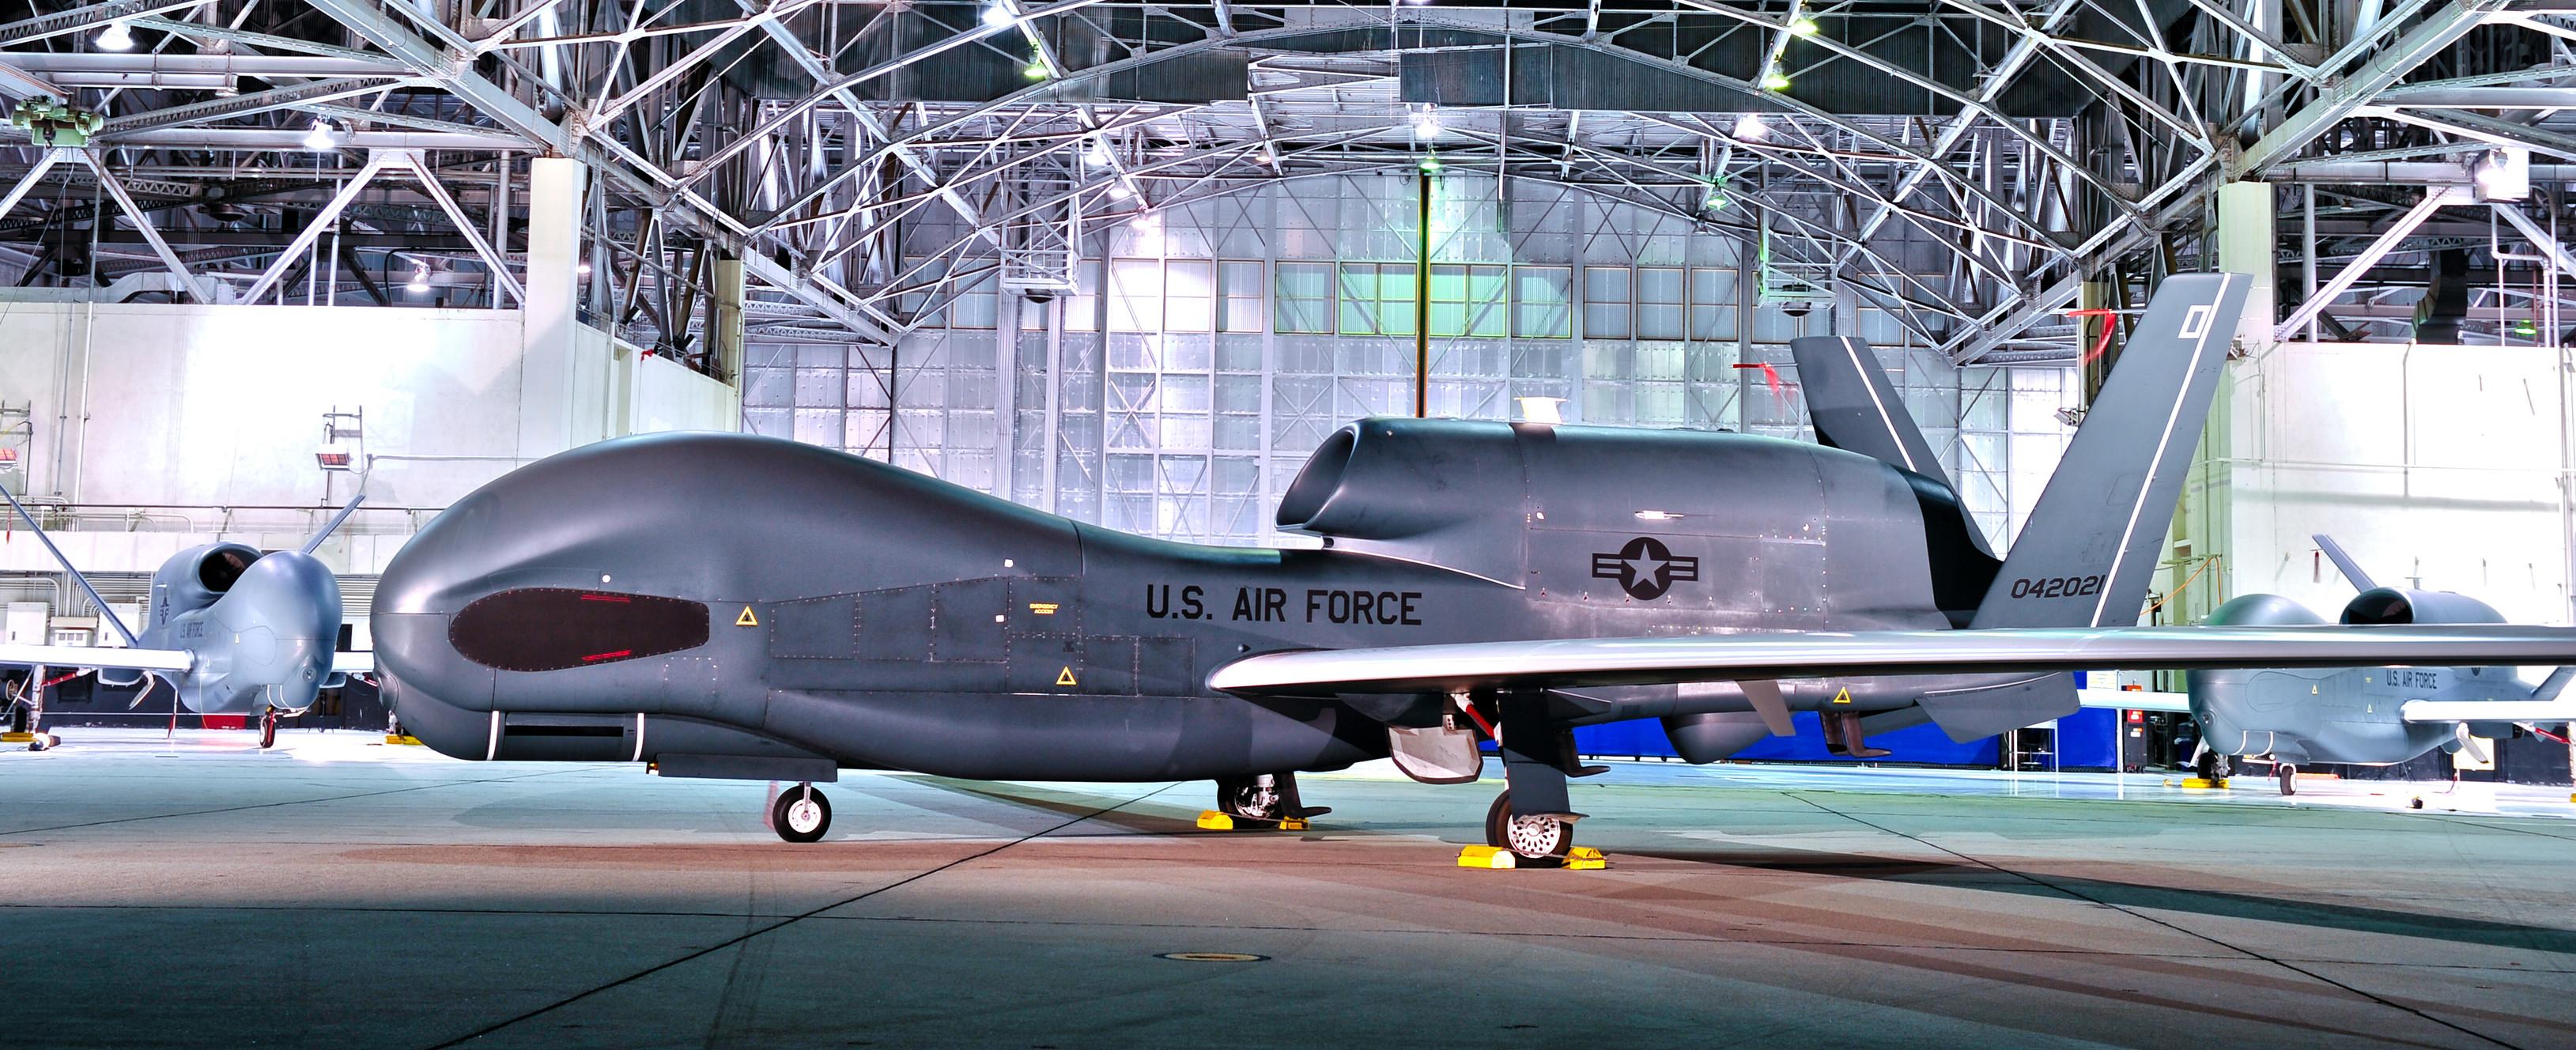 Northrop Grumman Gets Us Air Force Order For 3 More Rq 4